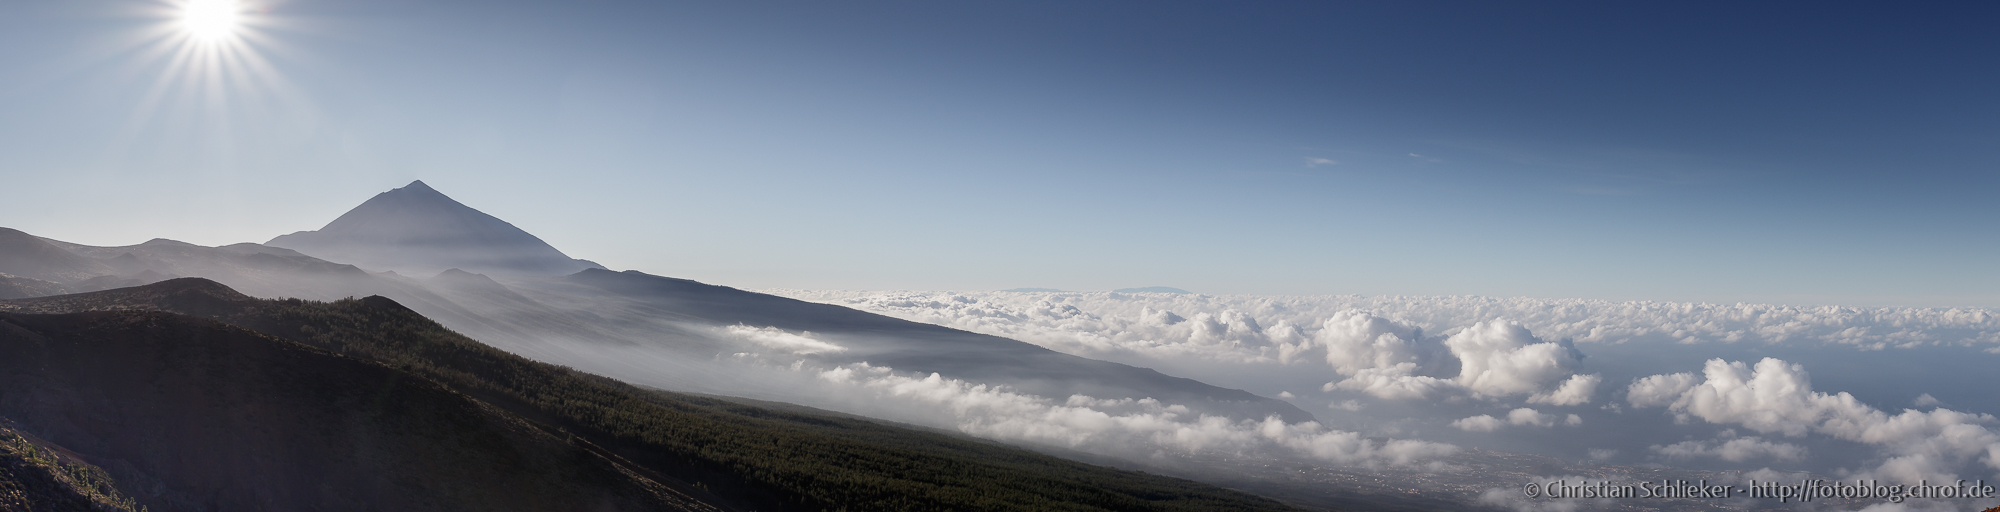 Panorama Vulkan Teide